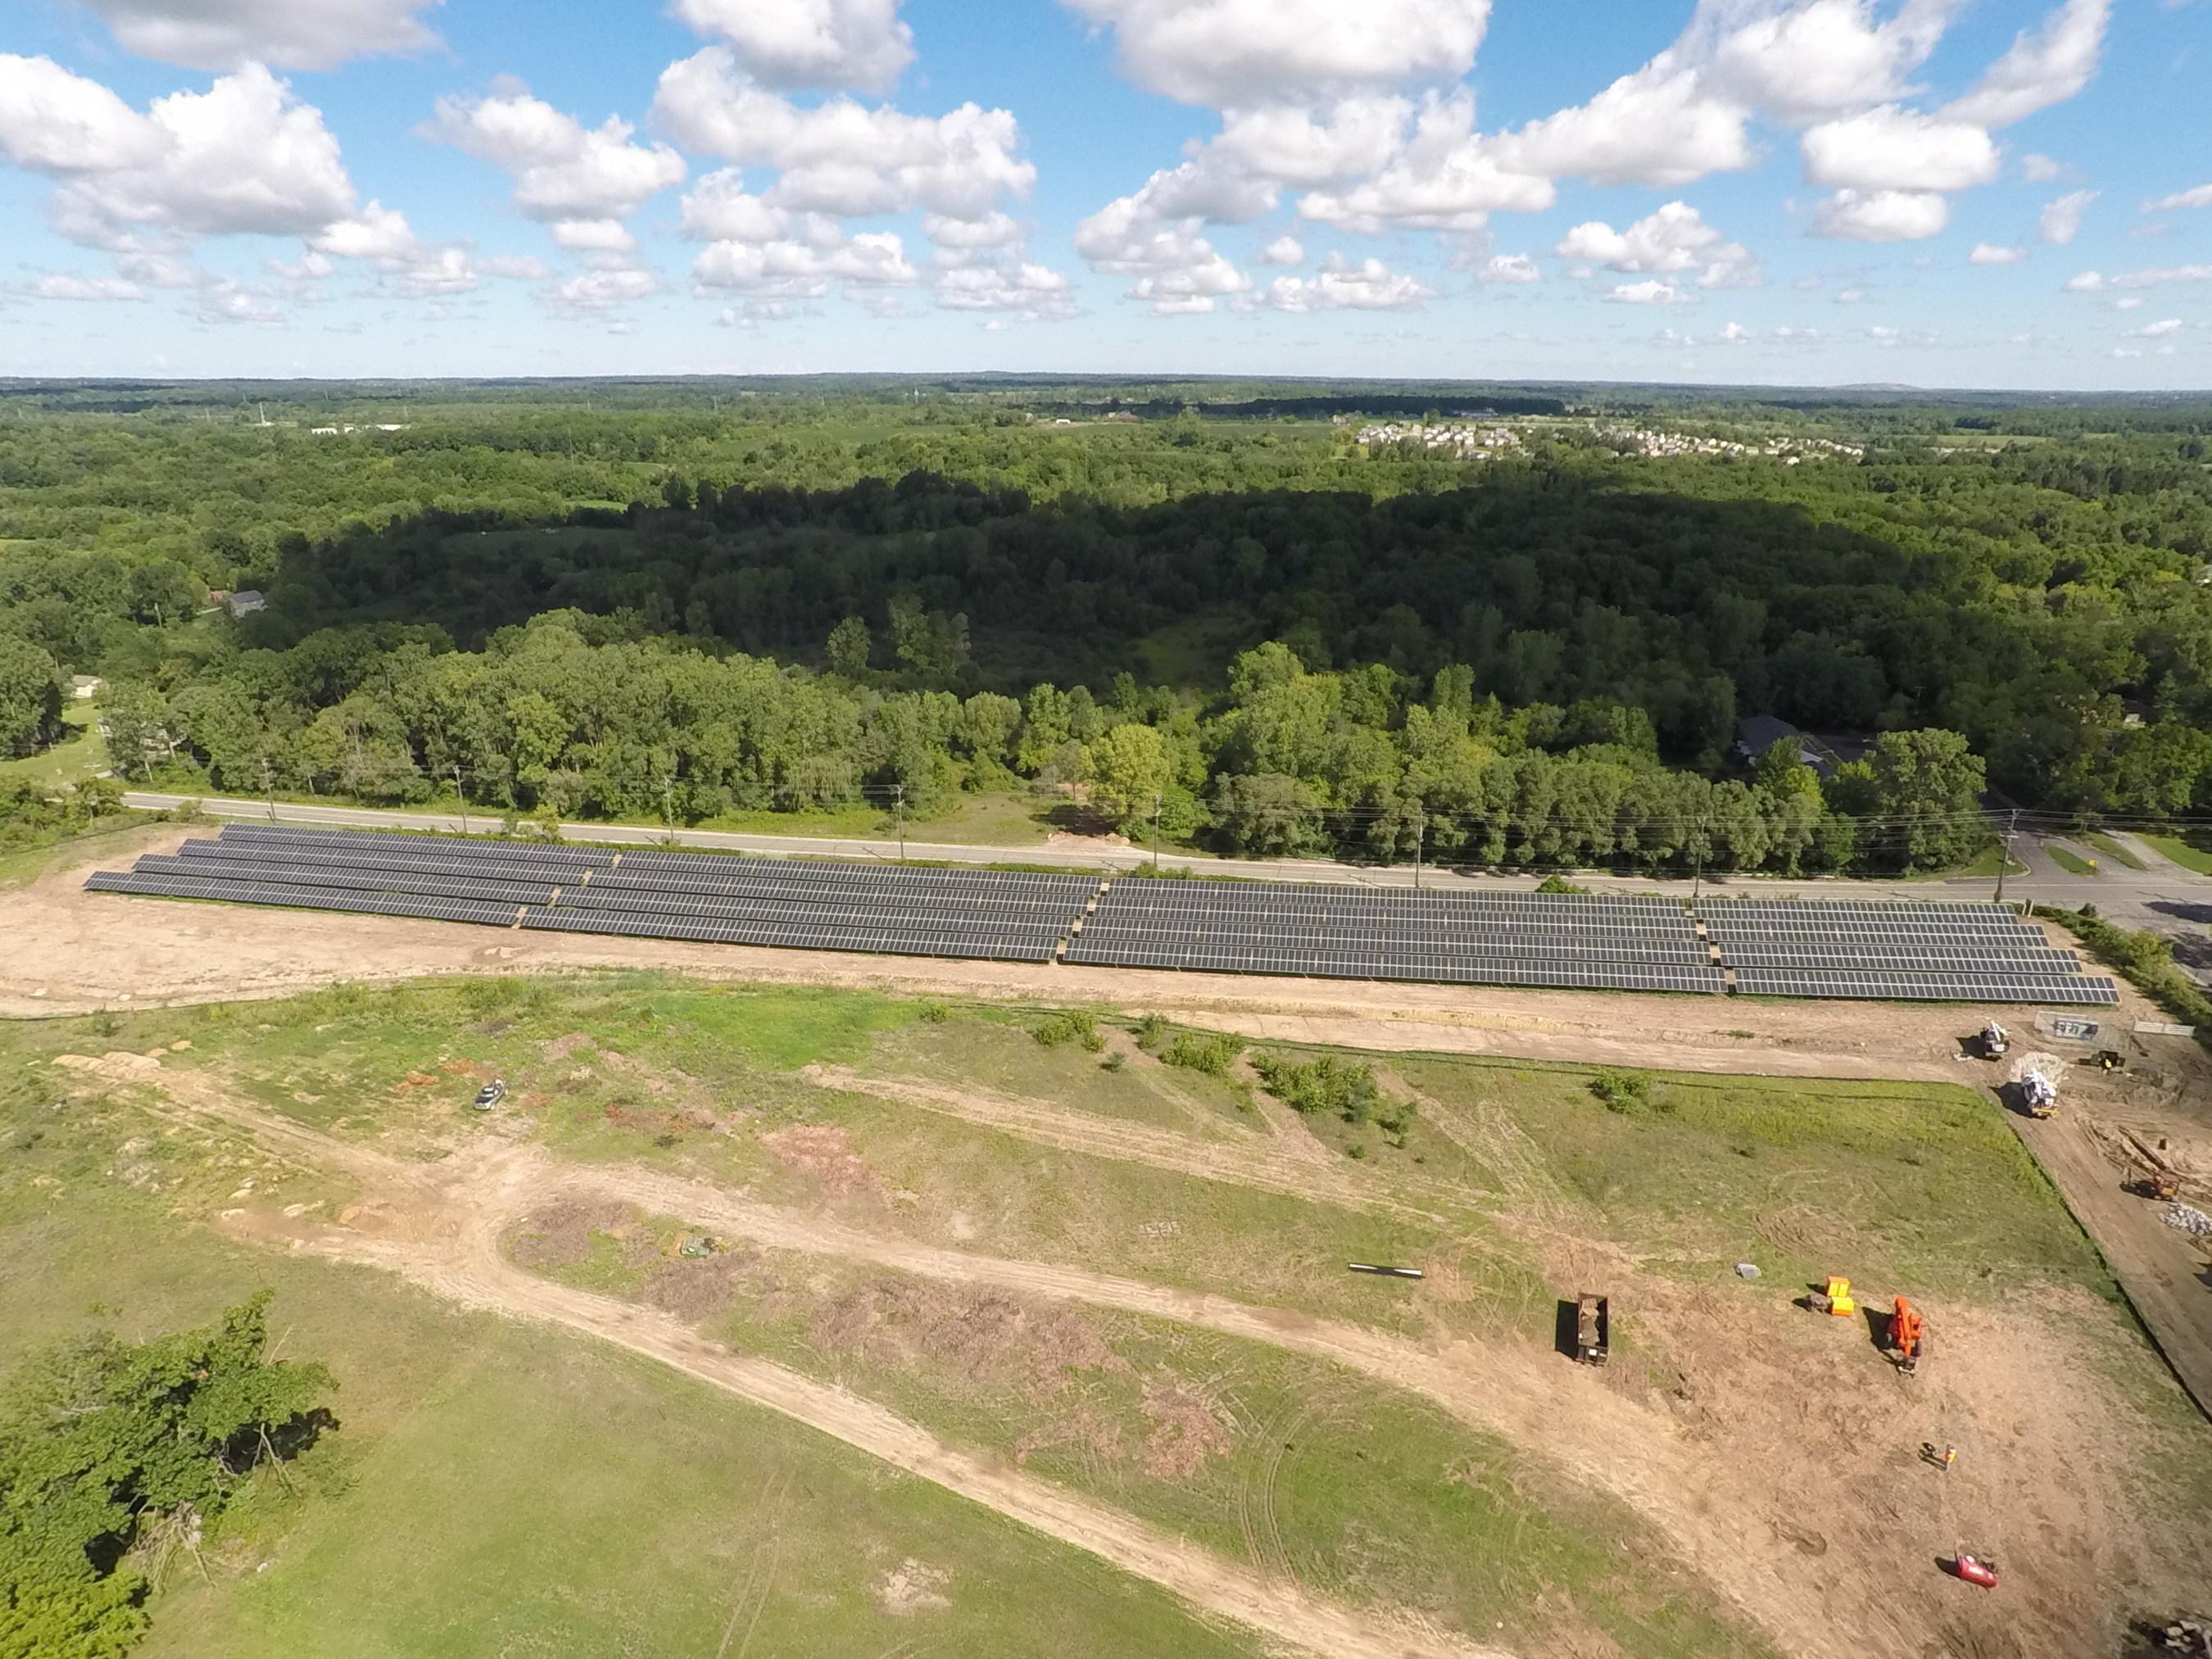 DTE' Energy's new solar array in Ypsilanti, MI.